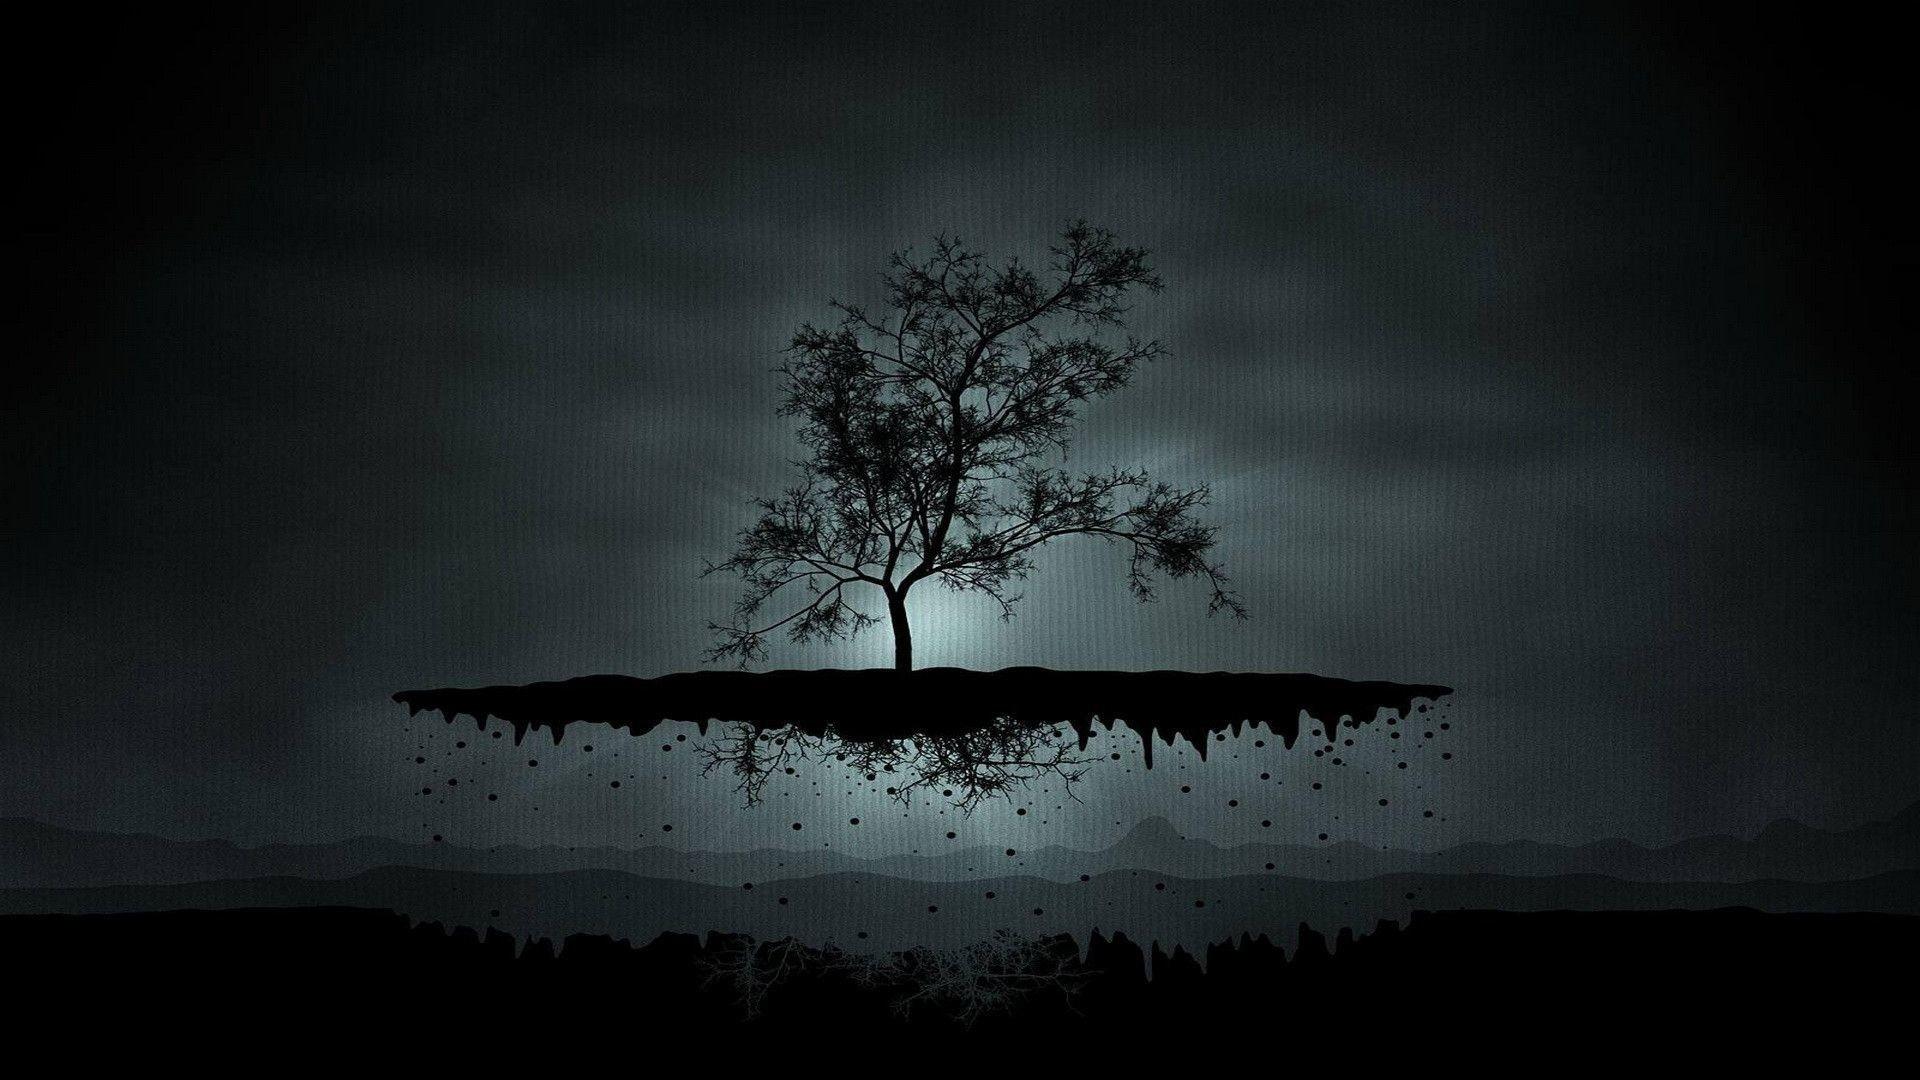 Dark Theme hd wallpaper download